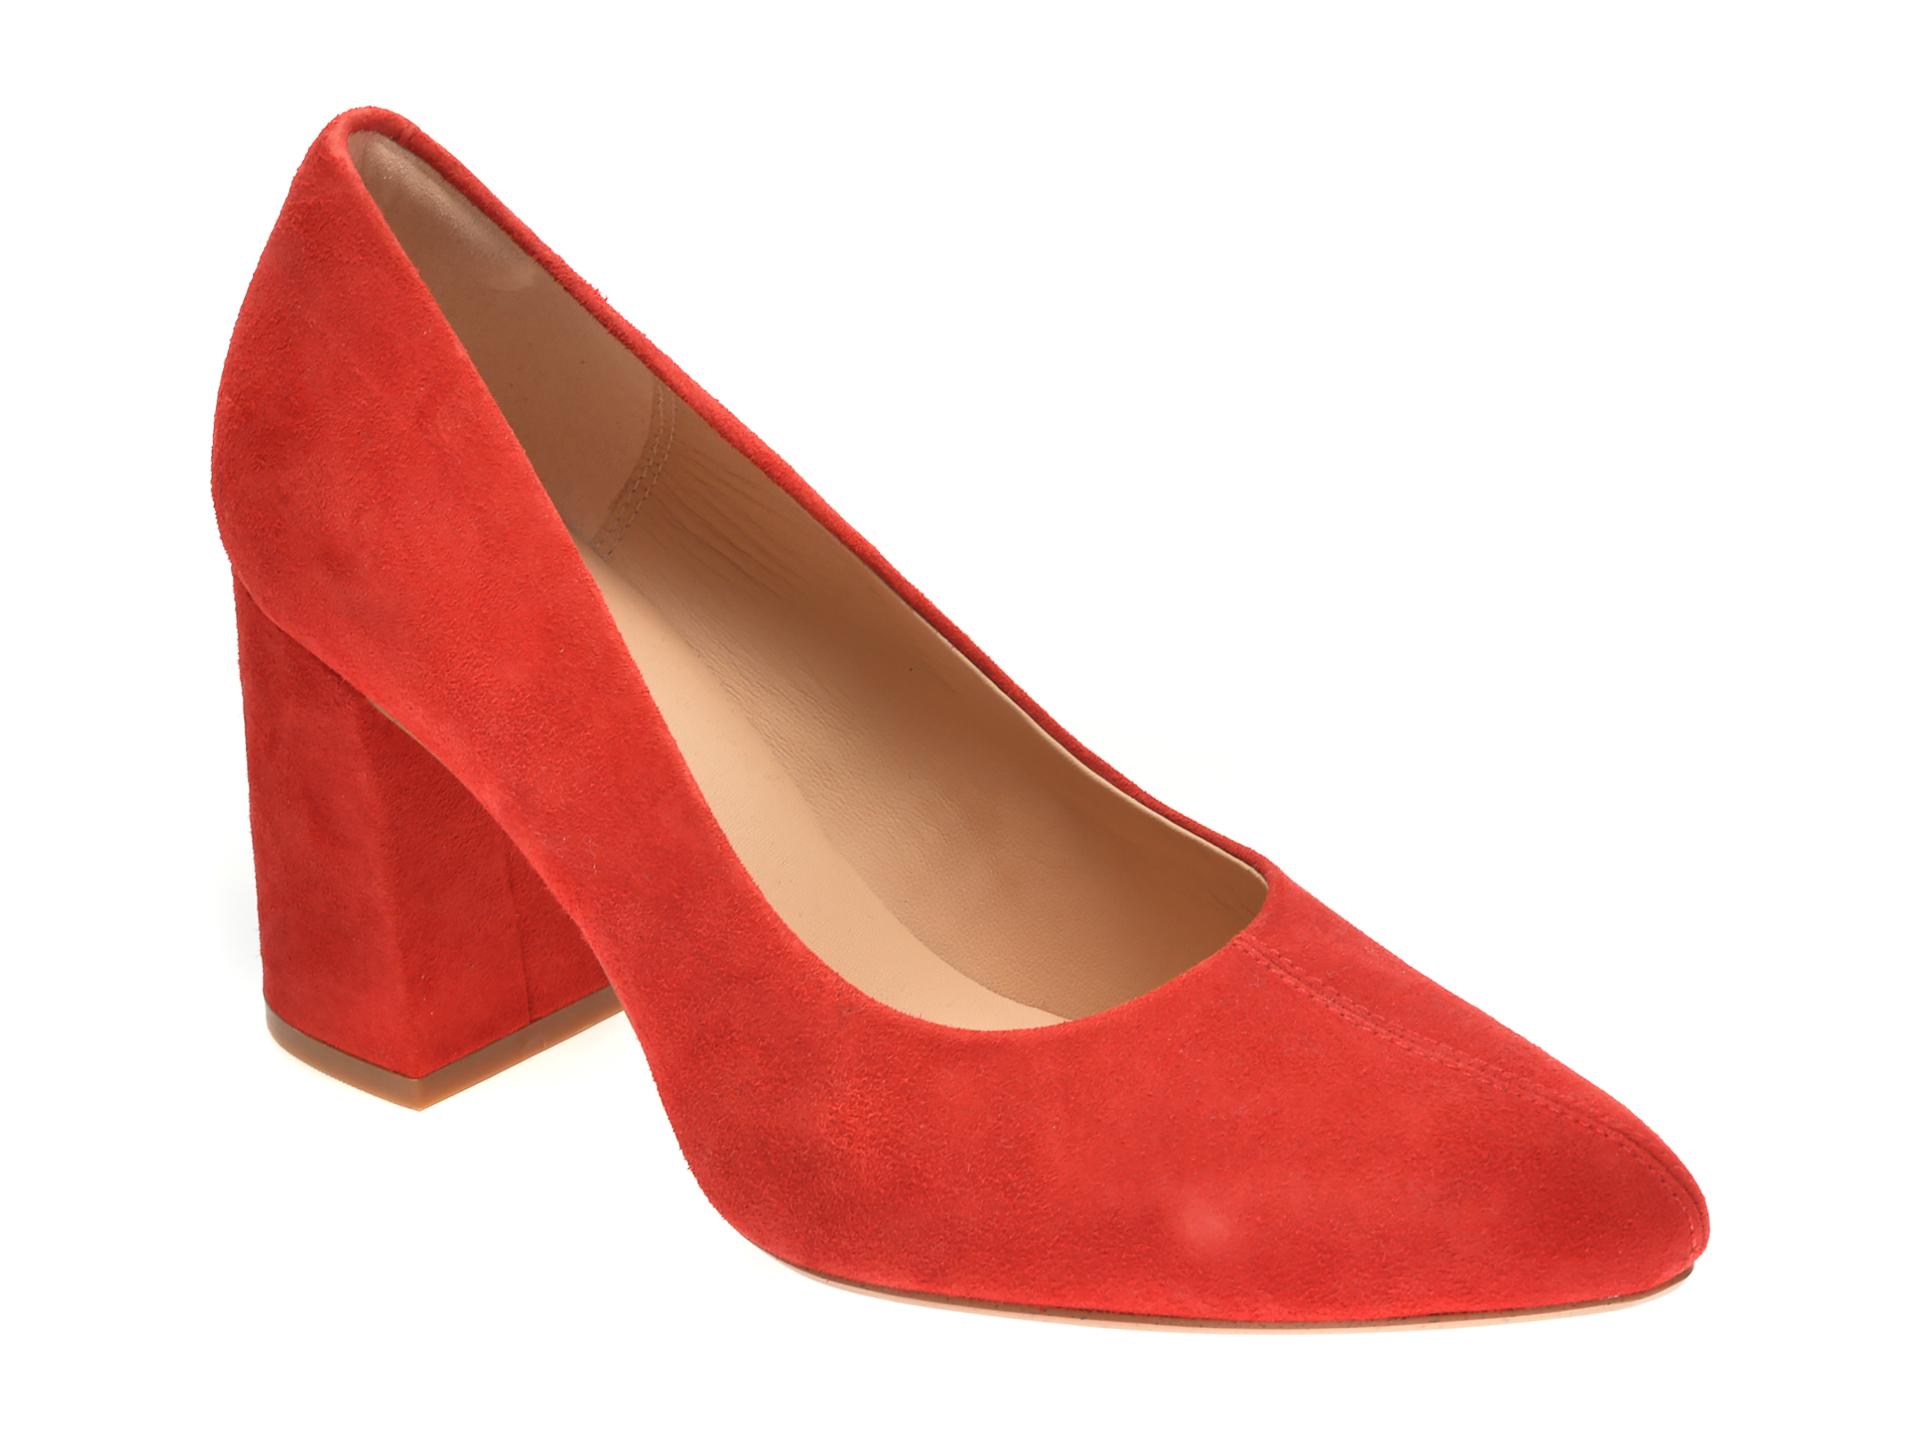 Pantofi CLARKS rosii, LAI85CO, din piele intoarsa